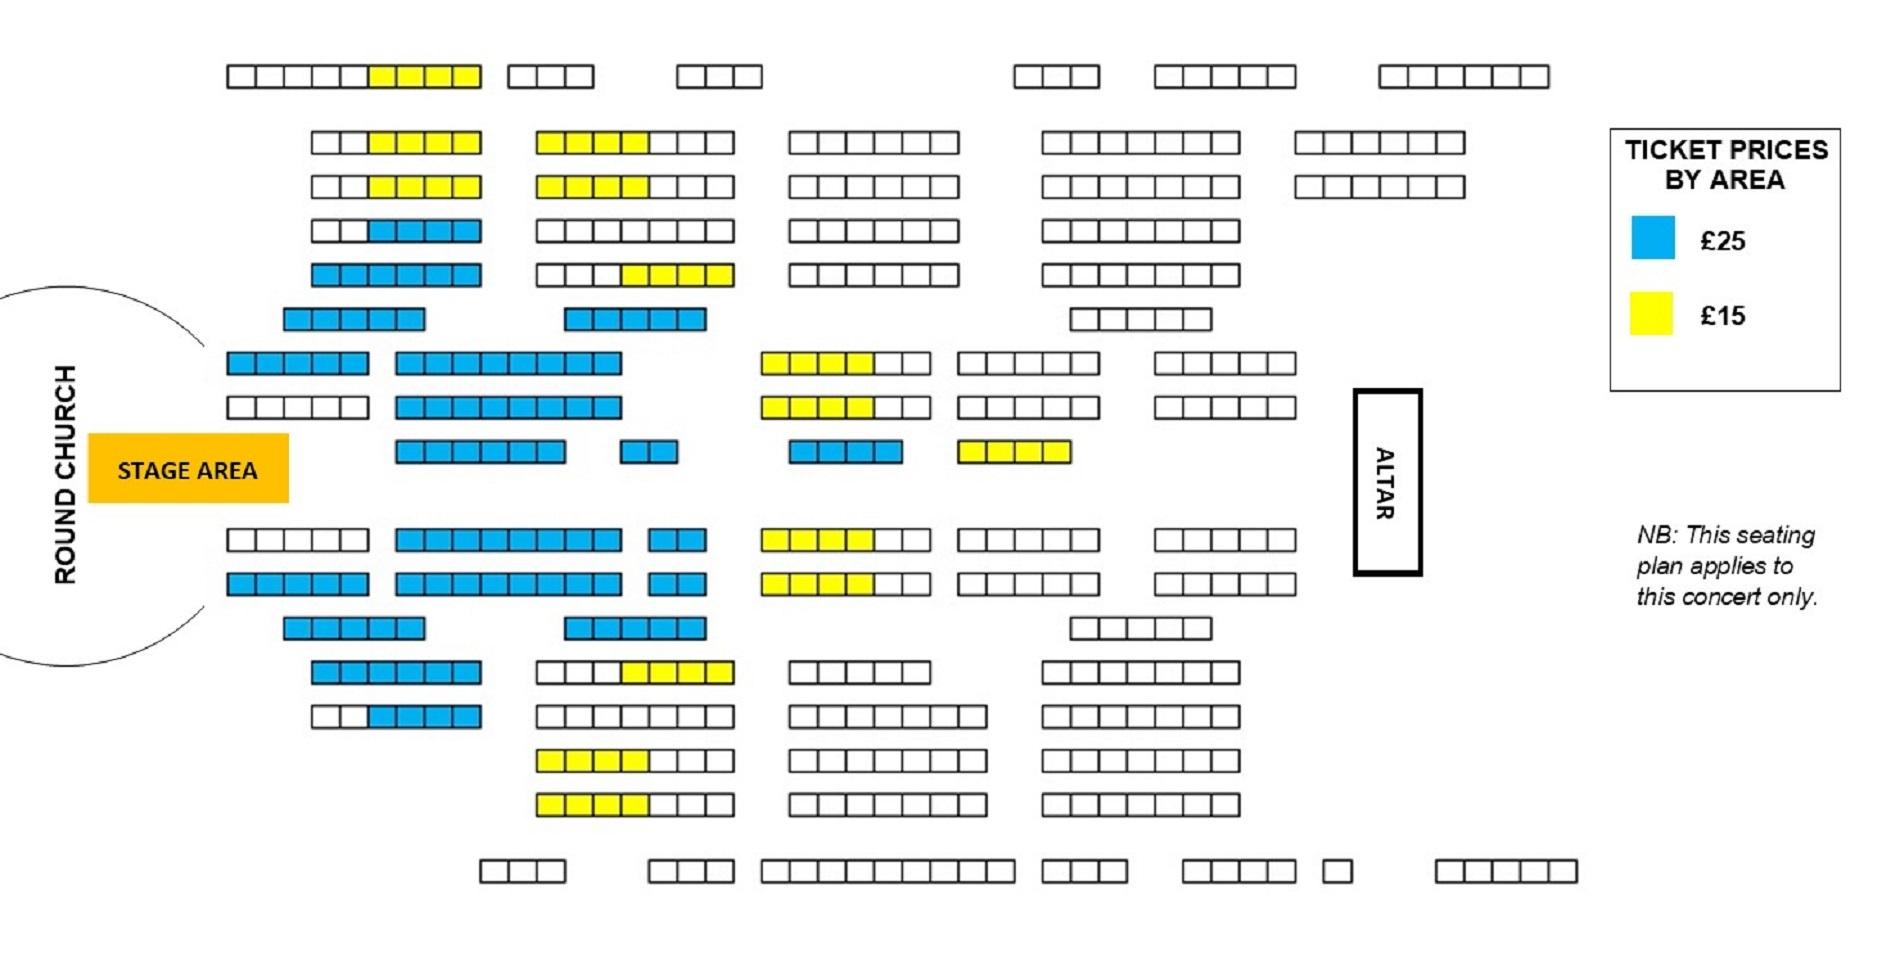 Seating plan Jeffrey Siegel Keyboard Conversations: Music of Joy and Peace